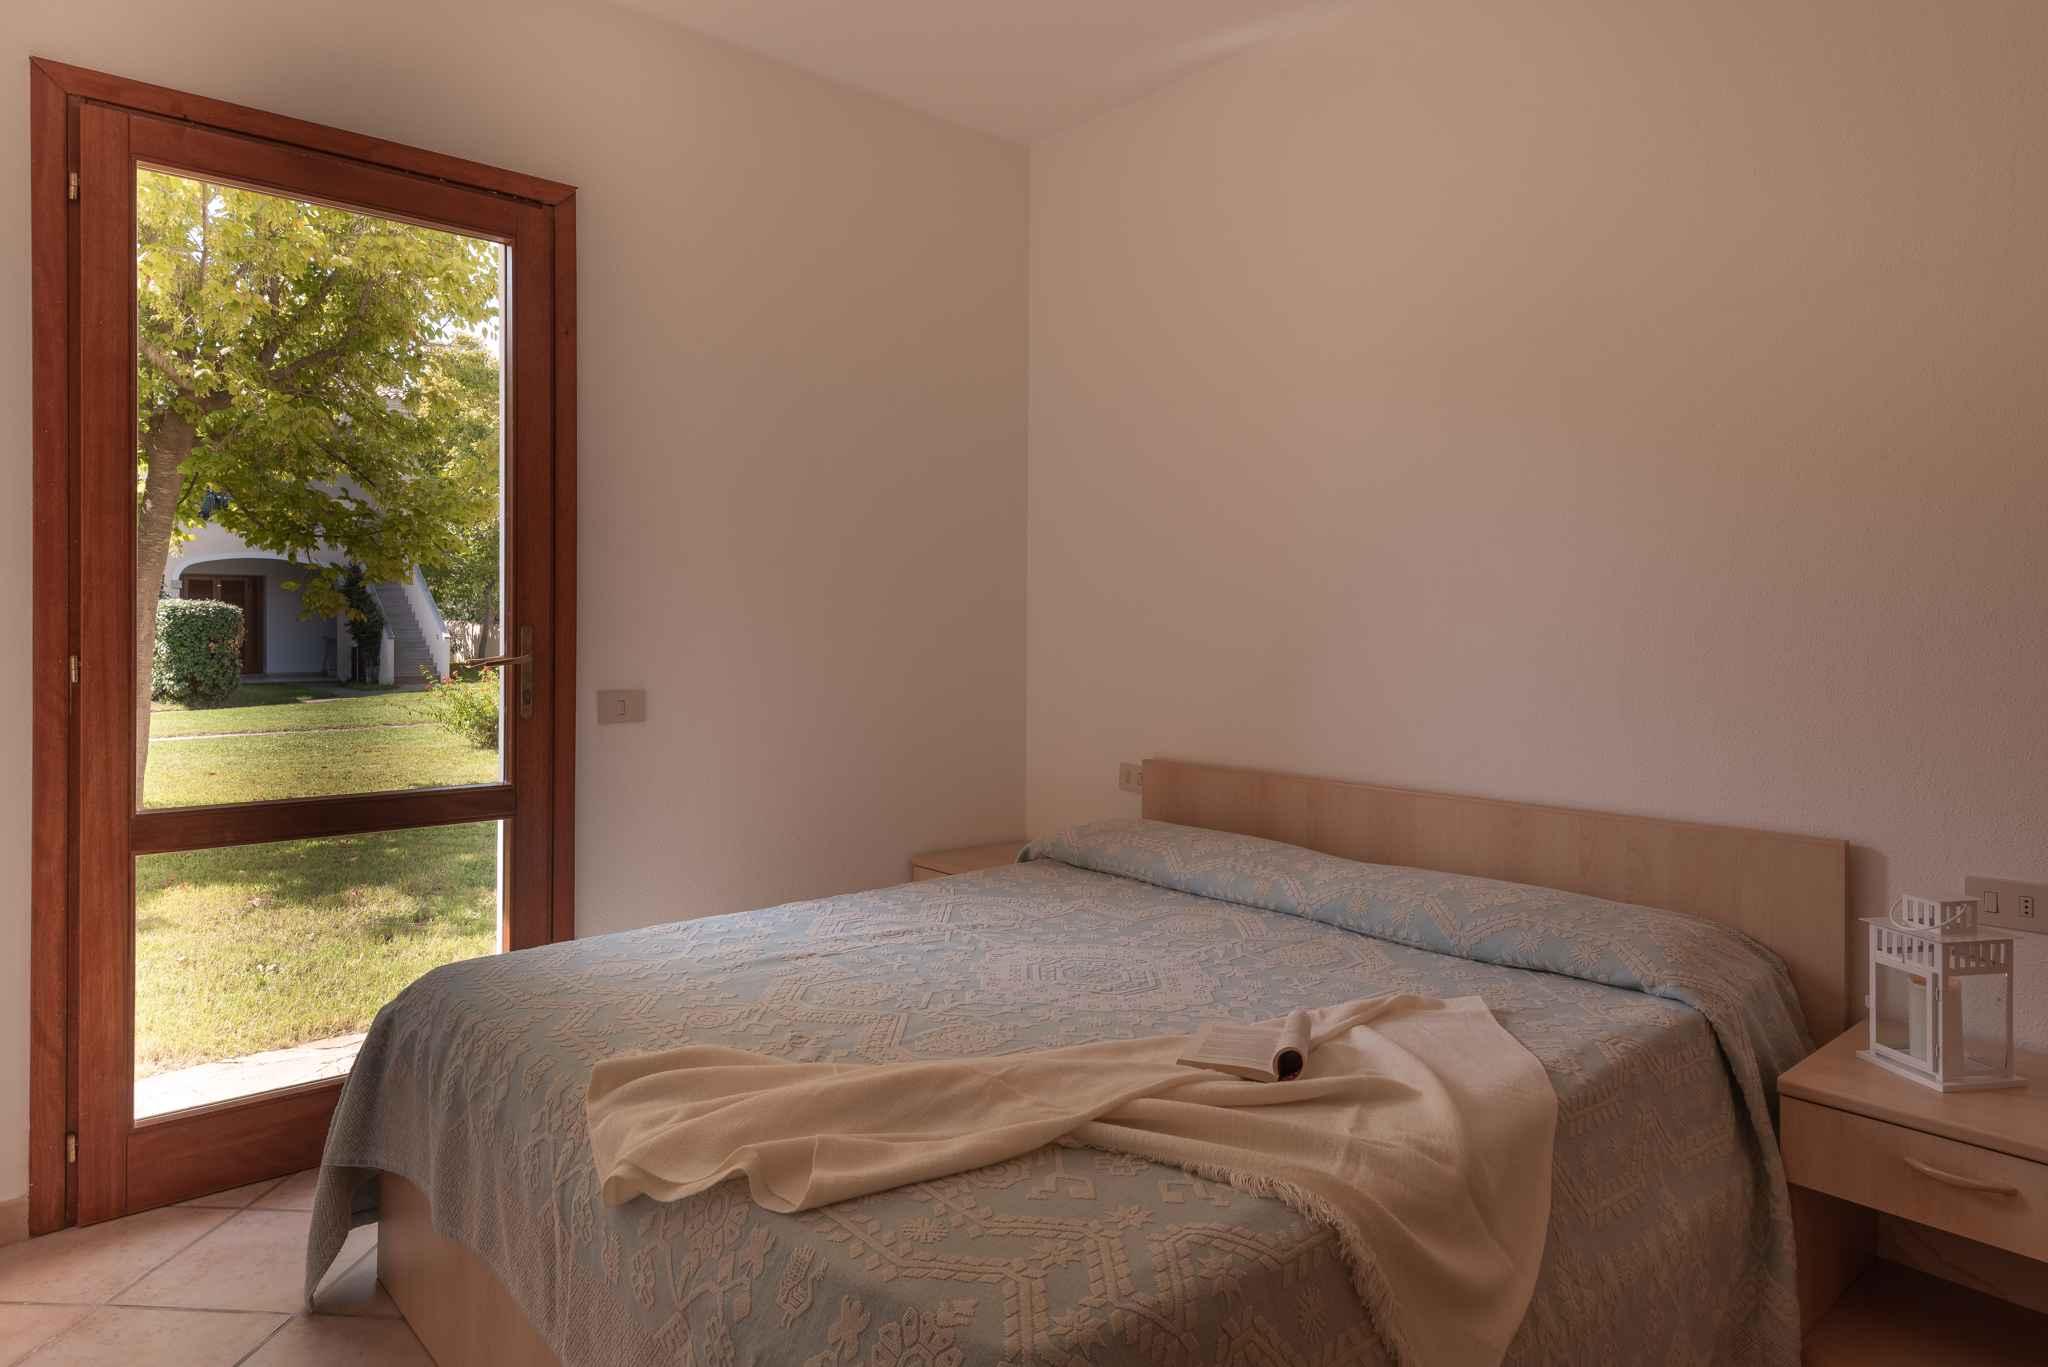 Ferienwohnung Appartamento 2 persone (2853259), Budoni, Olbia-Tempio, Sardinien, Italien, Bild 6